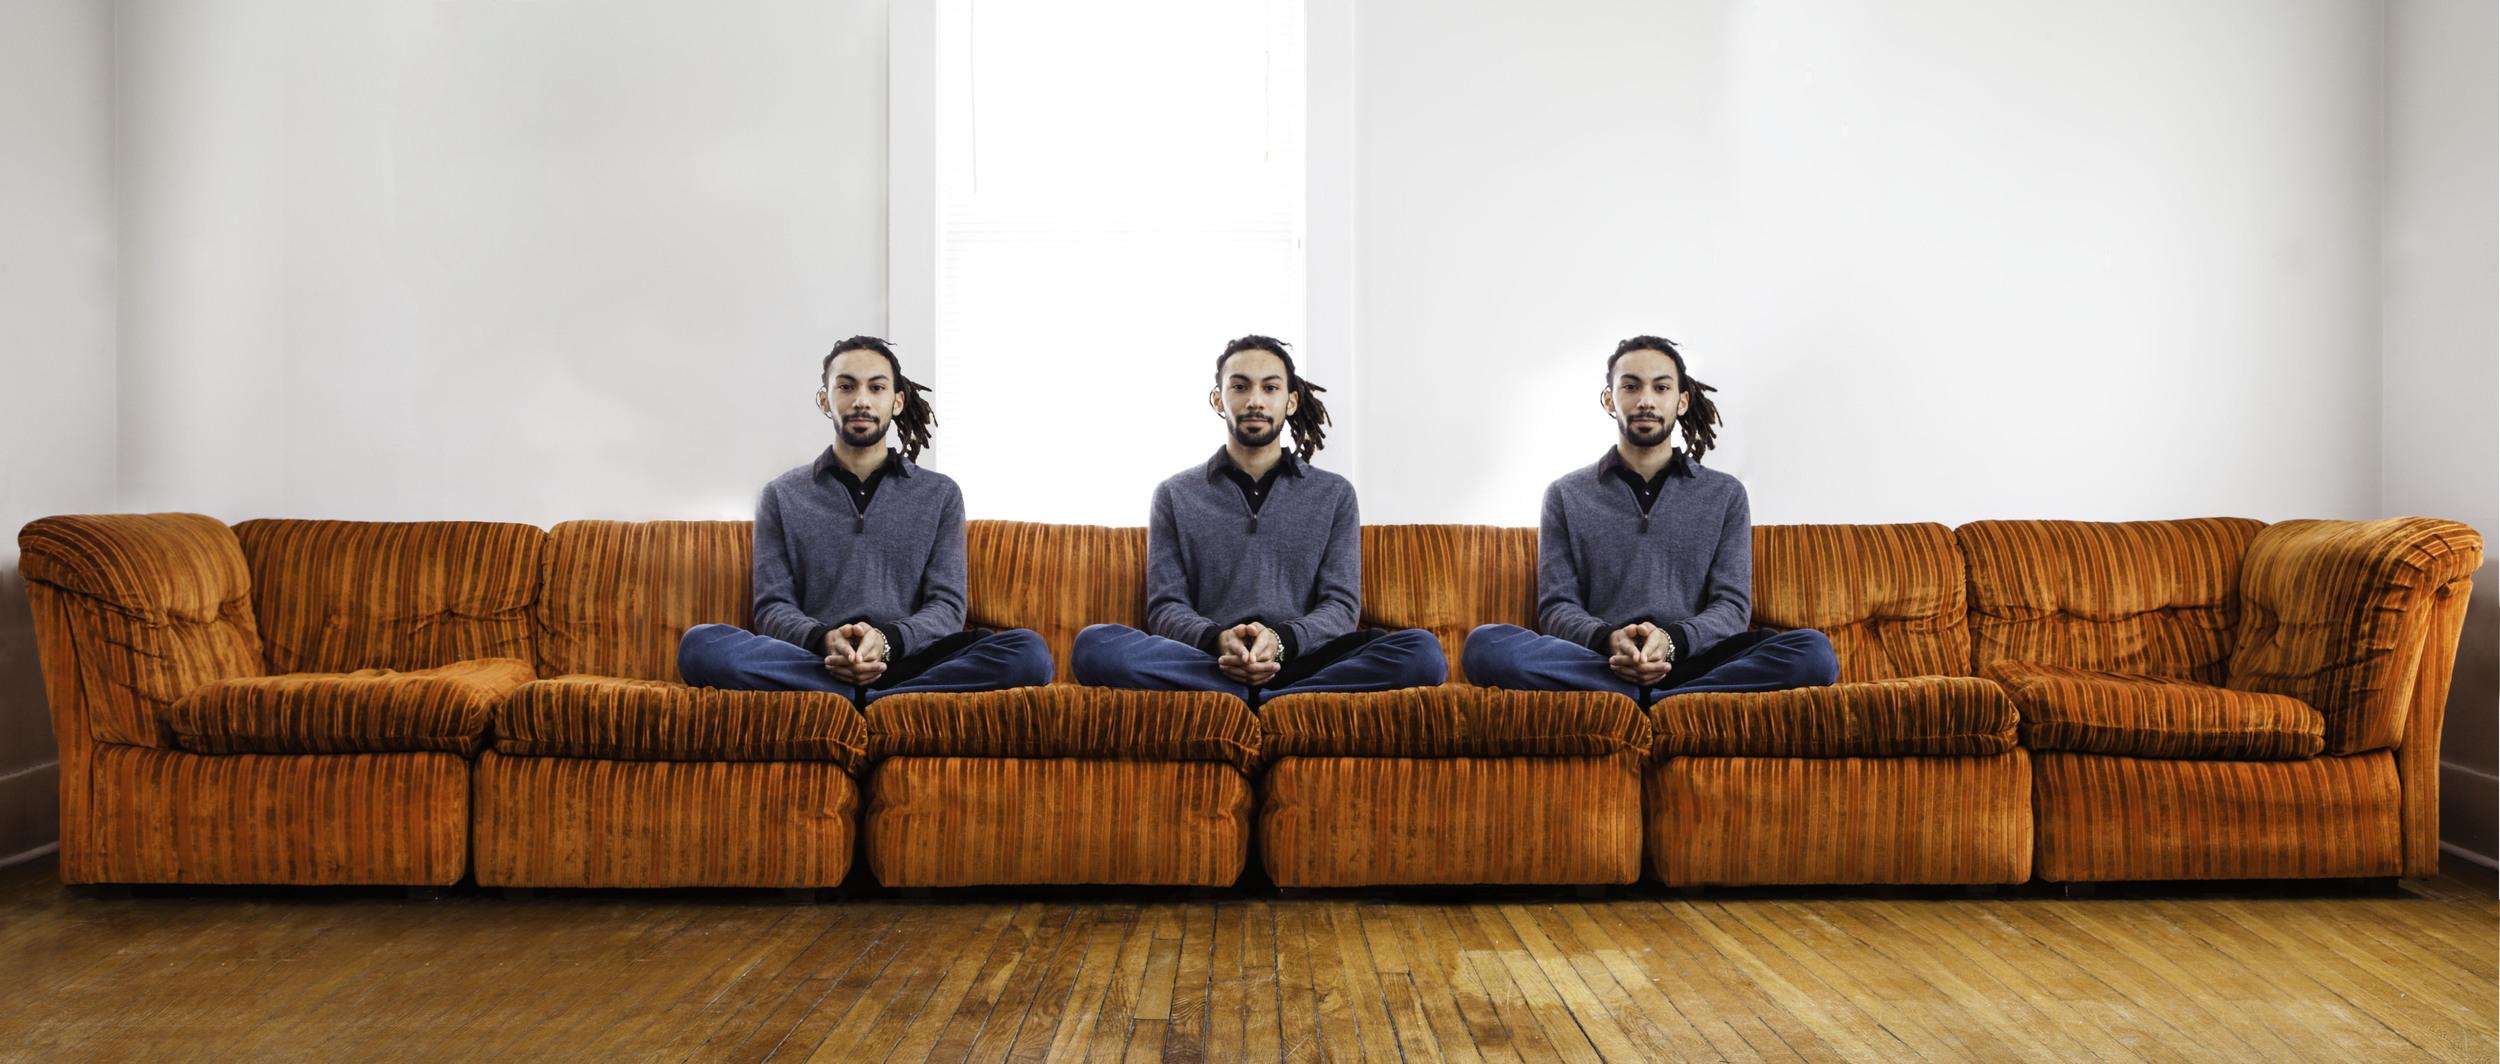 Lifestyle & Portrait Photographer  •   Ann Arbor  /  Detroit, Mi. USA